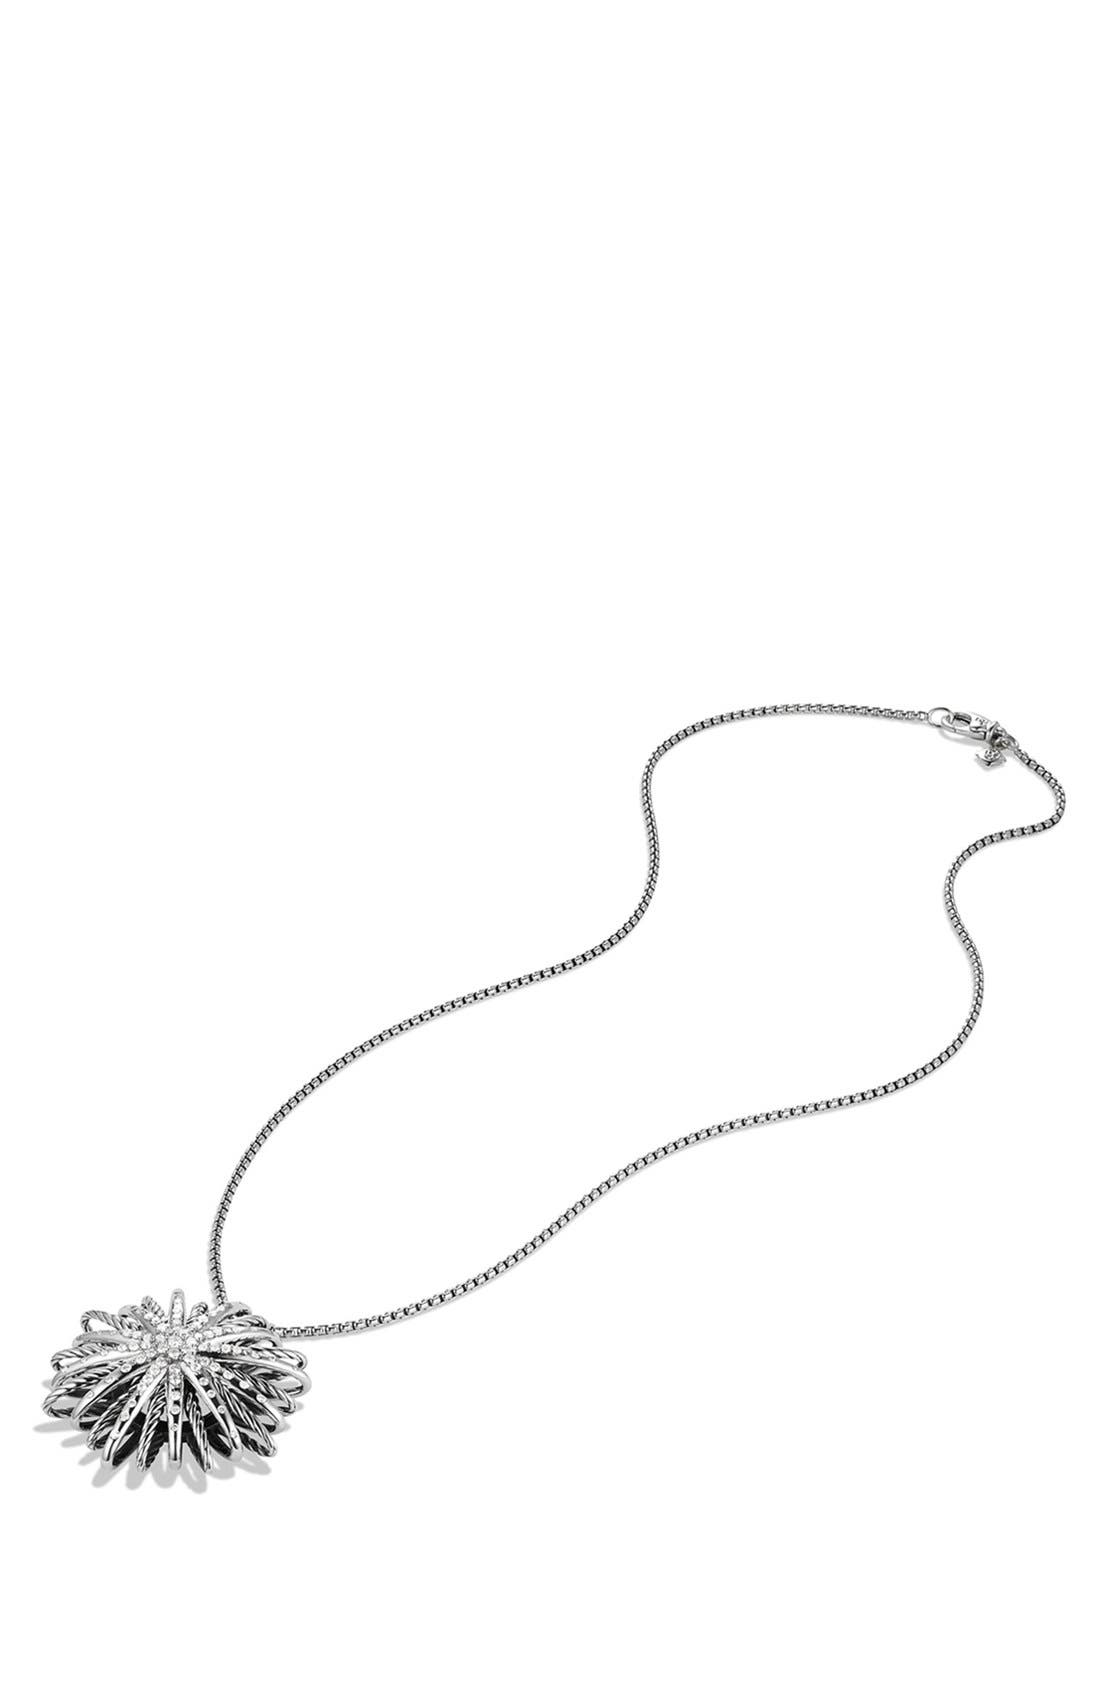 'Starburst' Large Pendant with Diamonds on Chain,                             Alternate thumbnail 3, color,                             DIAMOND